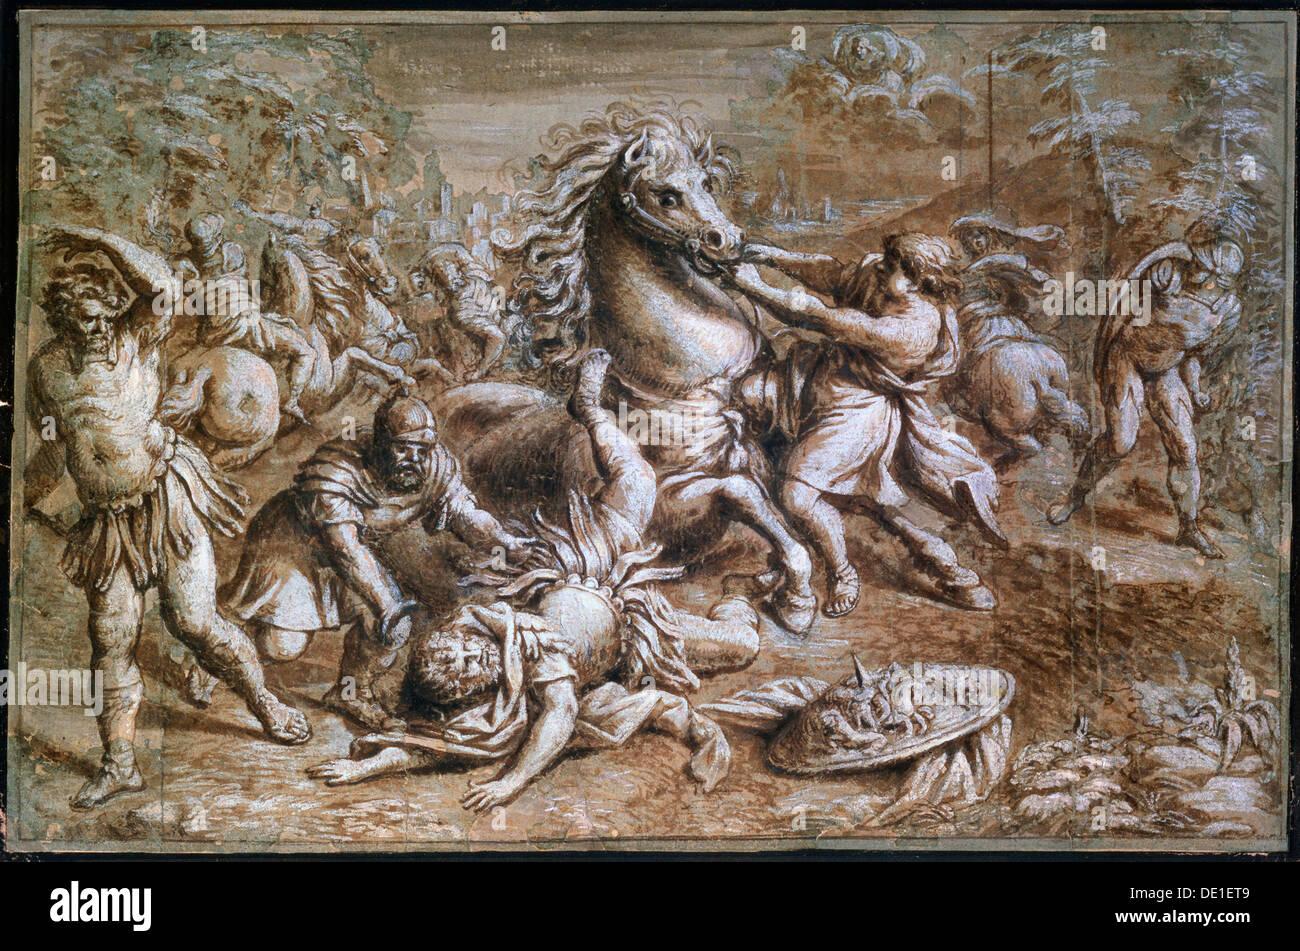 The Conversion of Saint Paul', 17th century. Artist: Pietro da Cortona - Stock Image